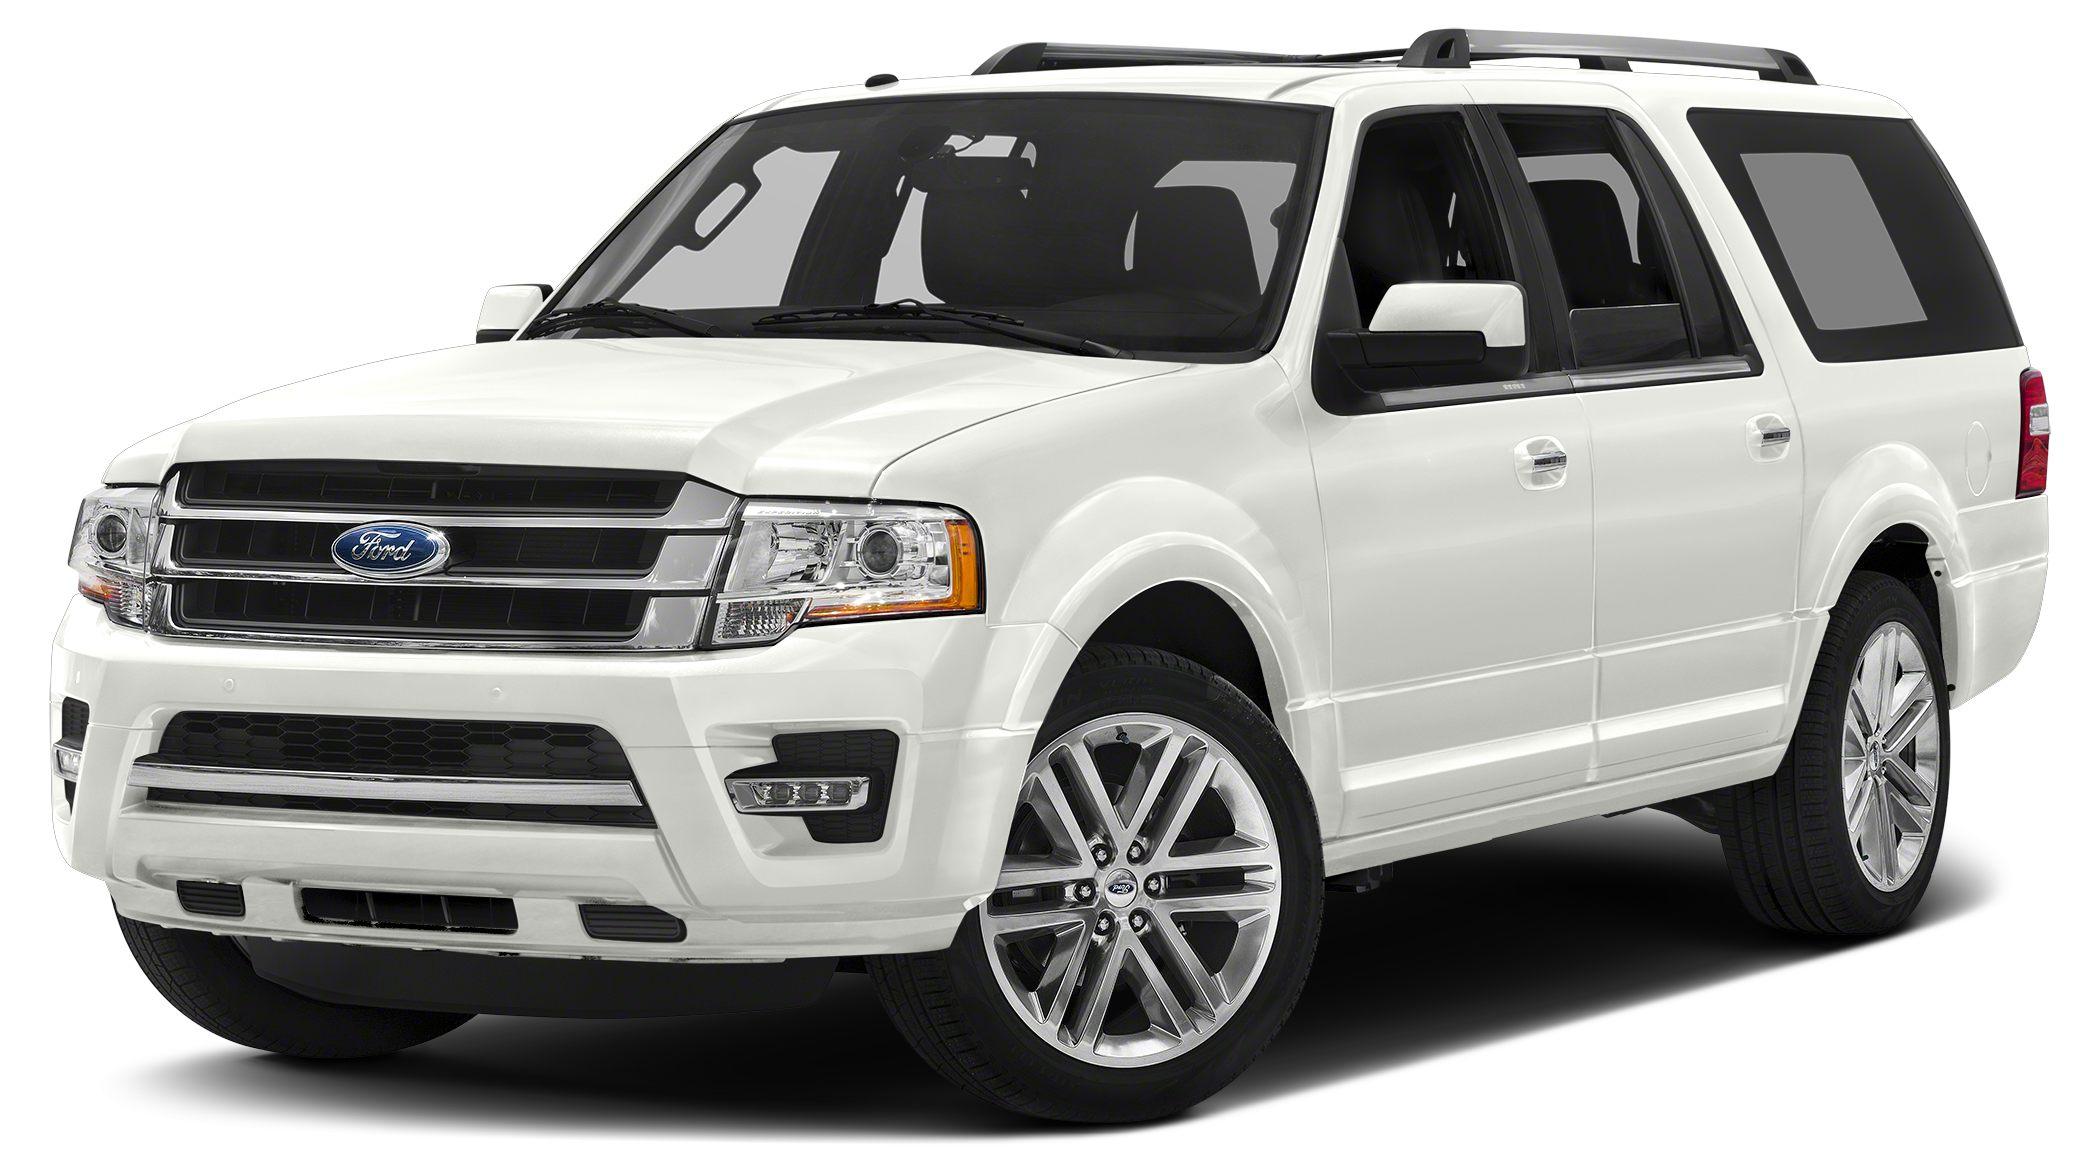 2017 Ford Expedition EL Limited Miles 8Color White Platinum Metallic Tri-Coat Stock 170311 VI